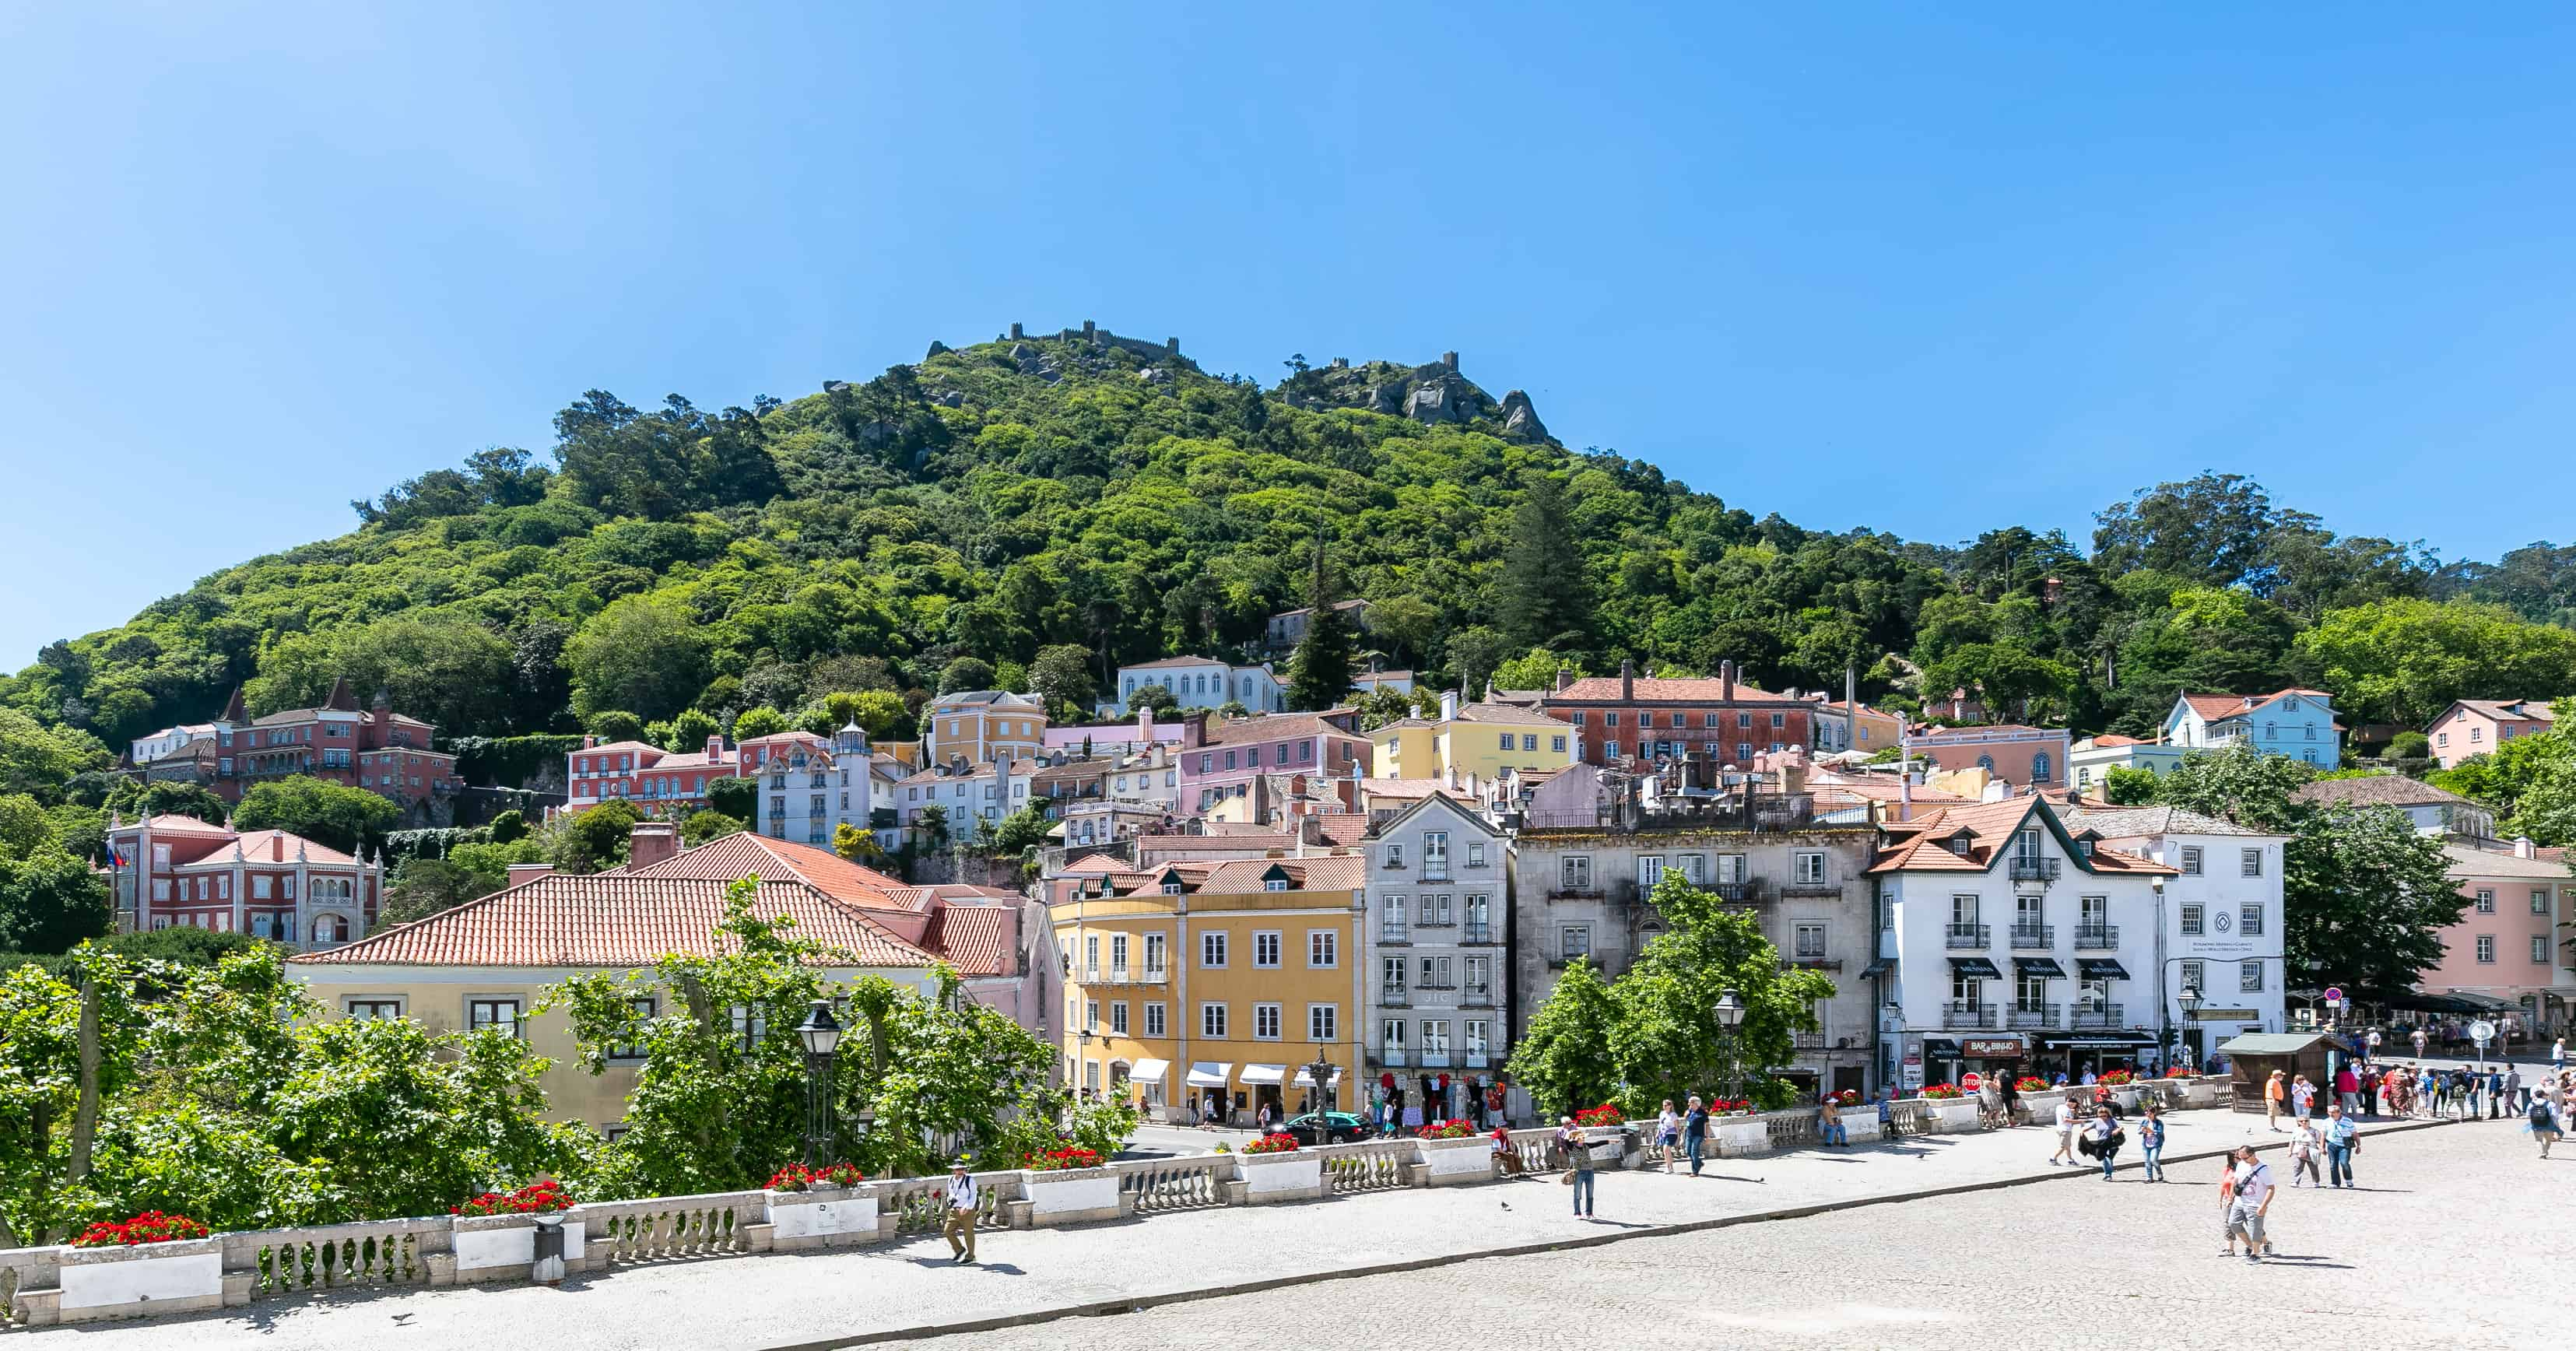 Sintra-Villa, the heart of Sintra